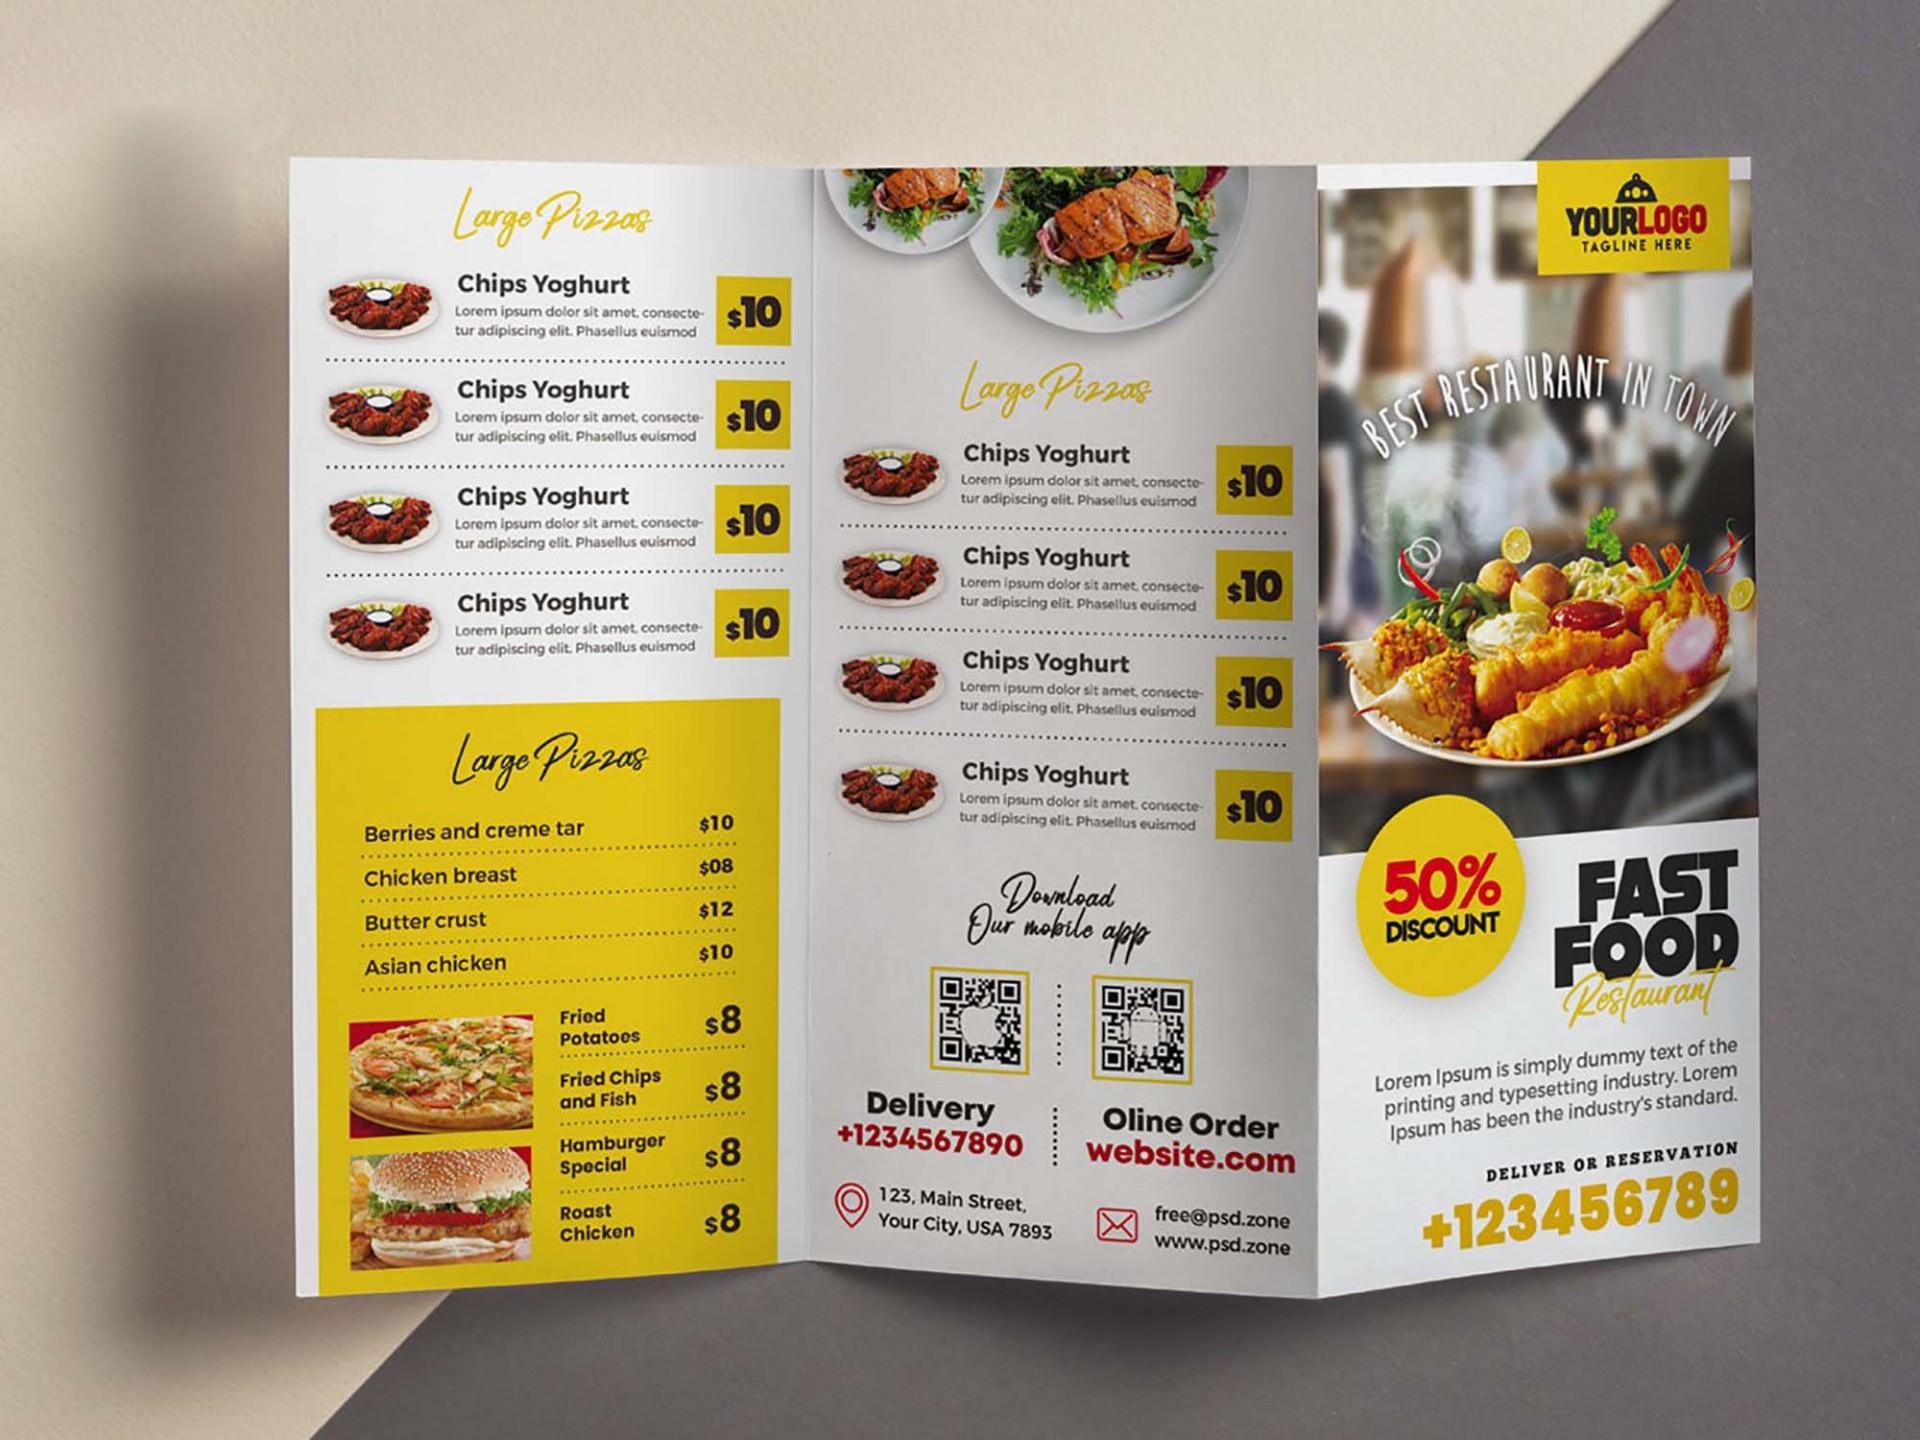 009 Dreaded Food Menu Card Template Free Download Inspiration 1920